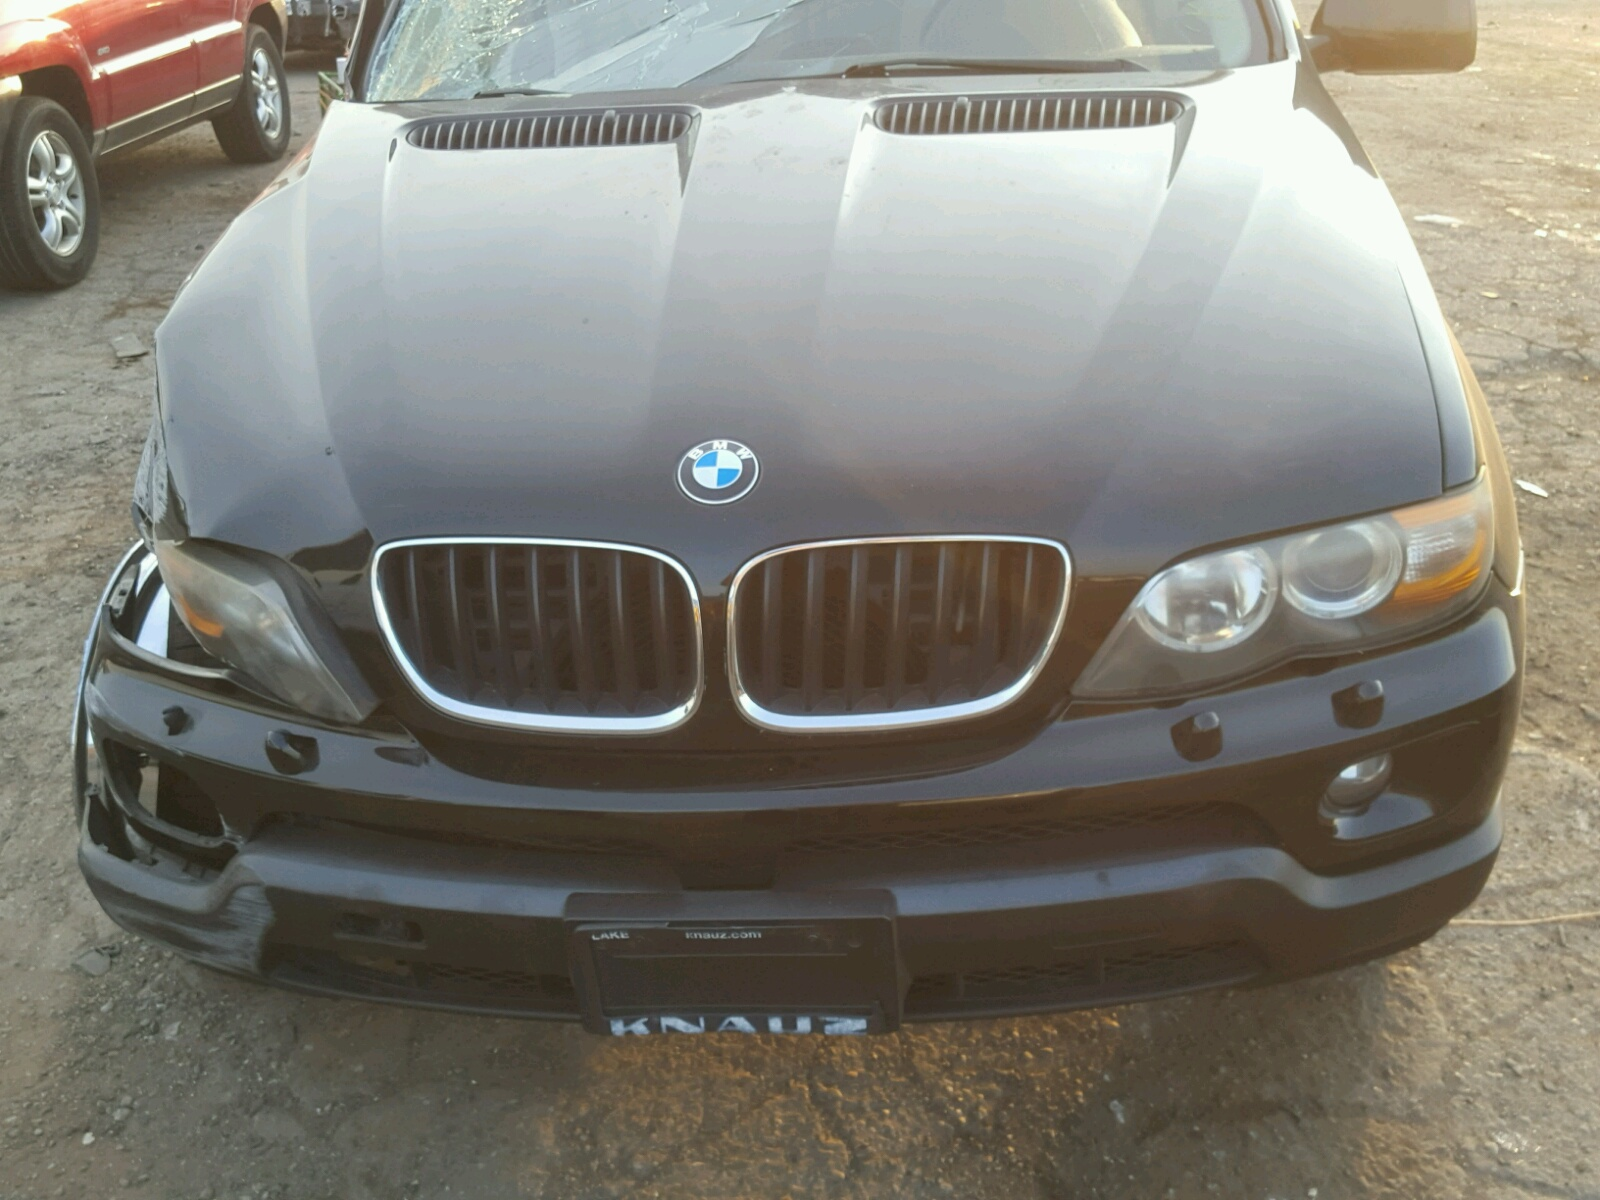 2005 Bmw X5 3 0I 3 0L 6 in MI - Detroit (5UXFA135X5LY23138) for Sale